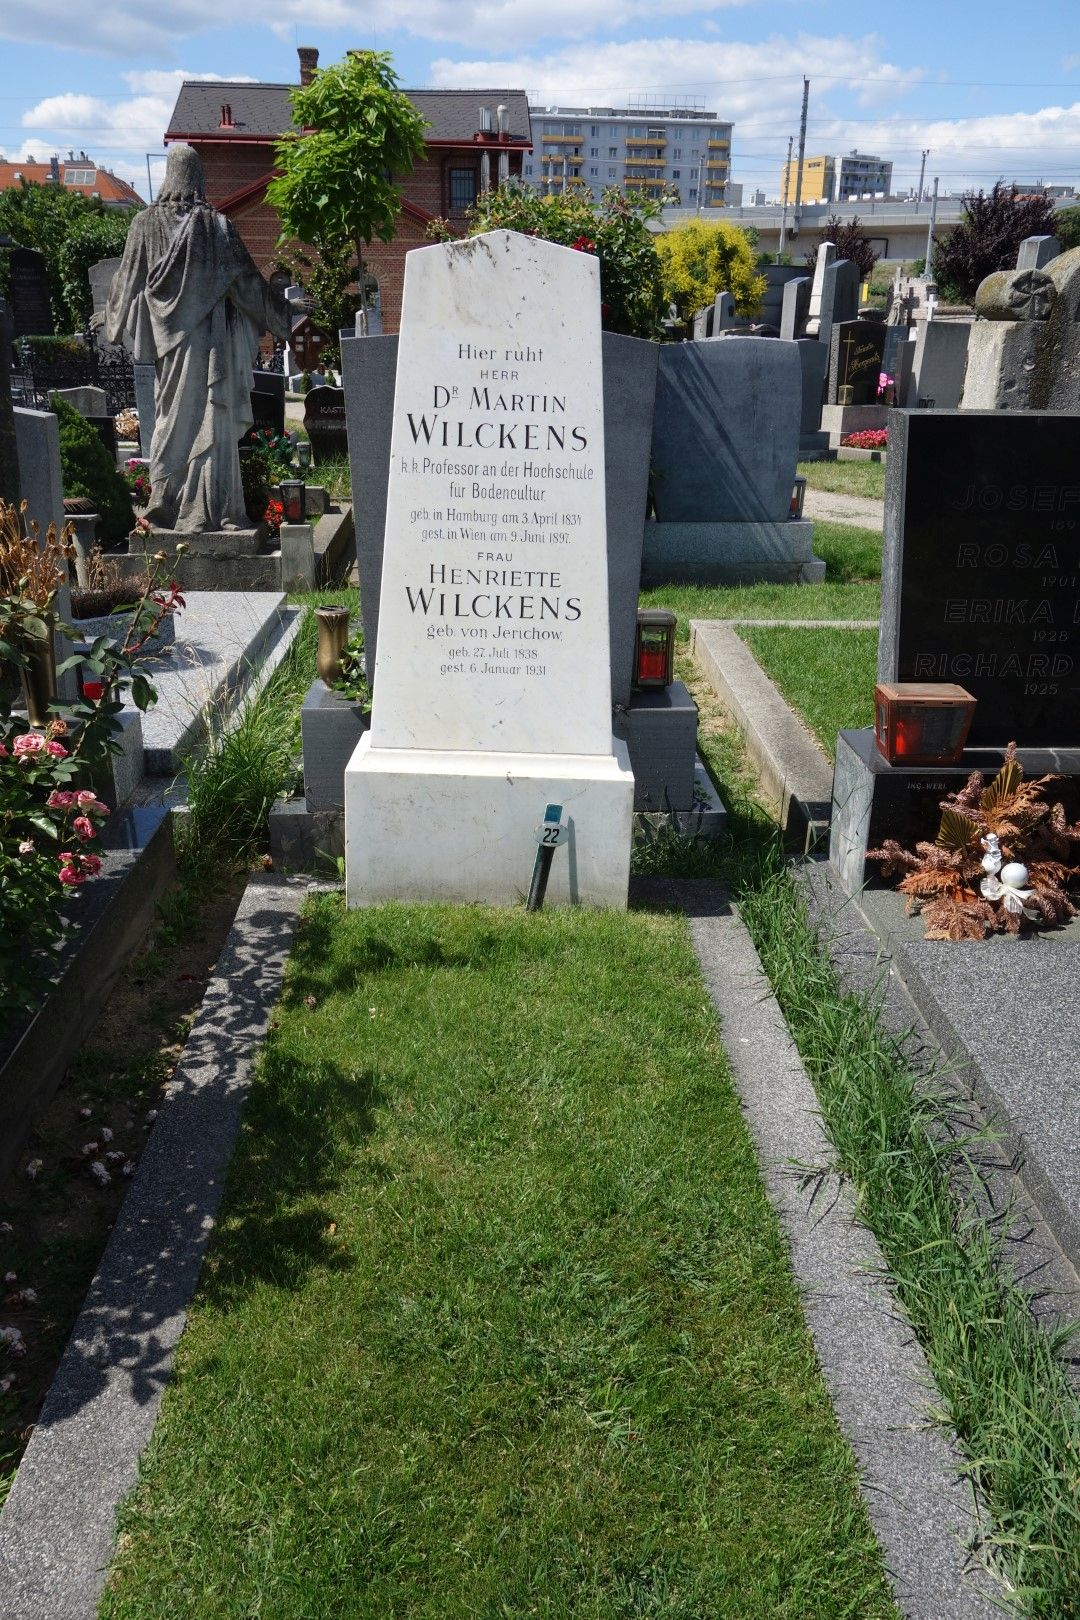 Martin WILCKENS